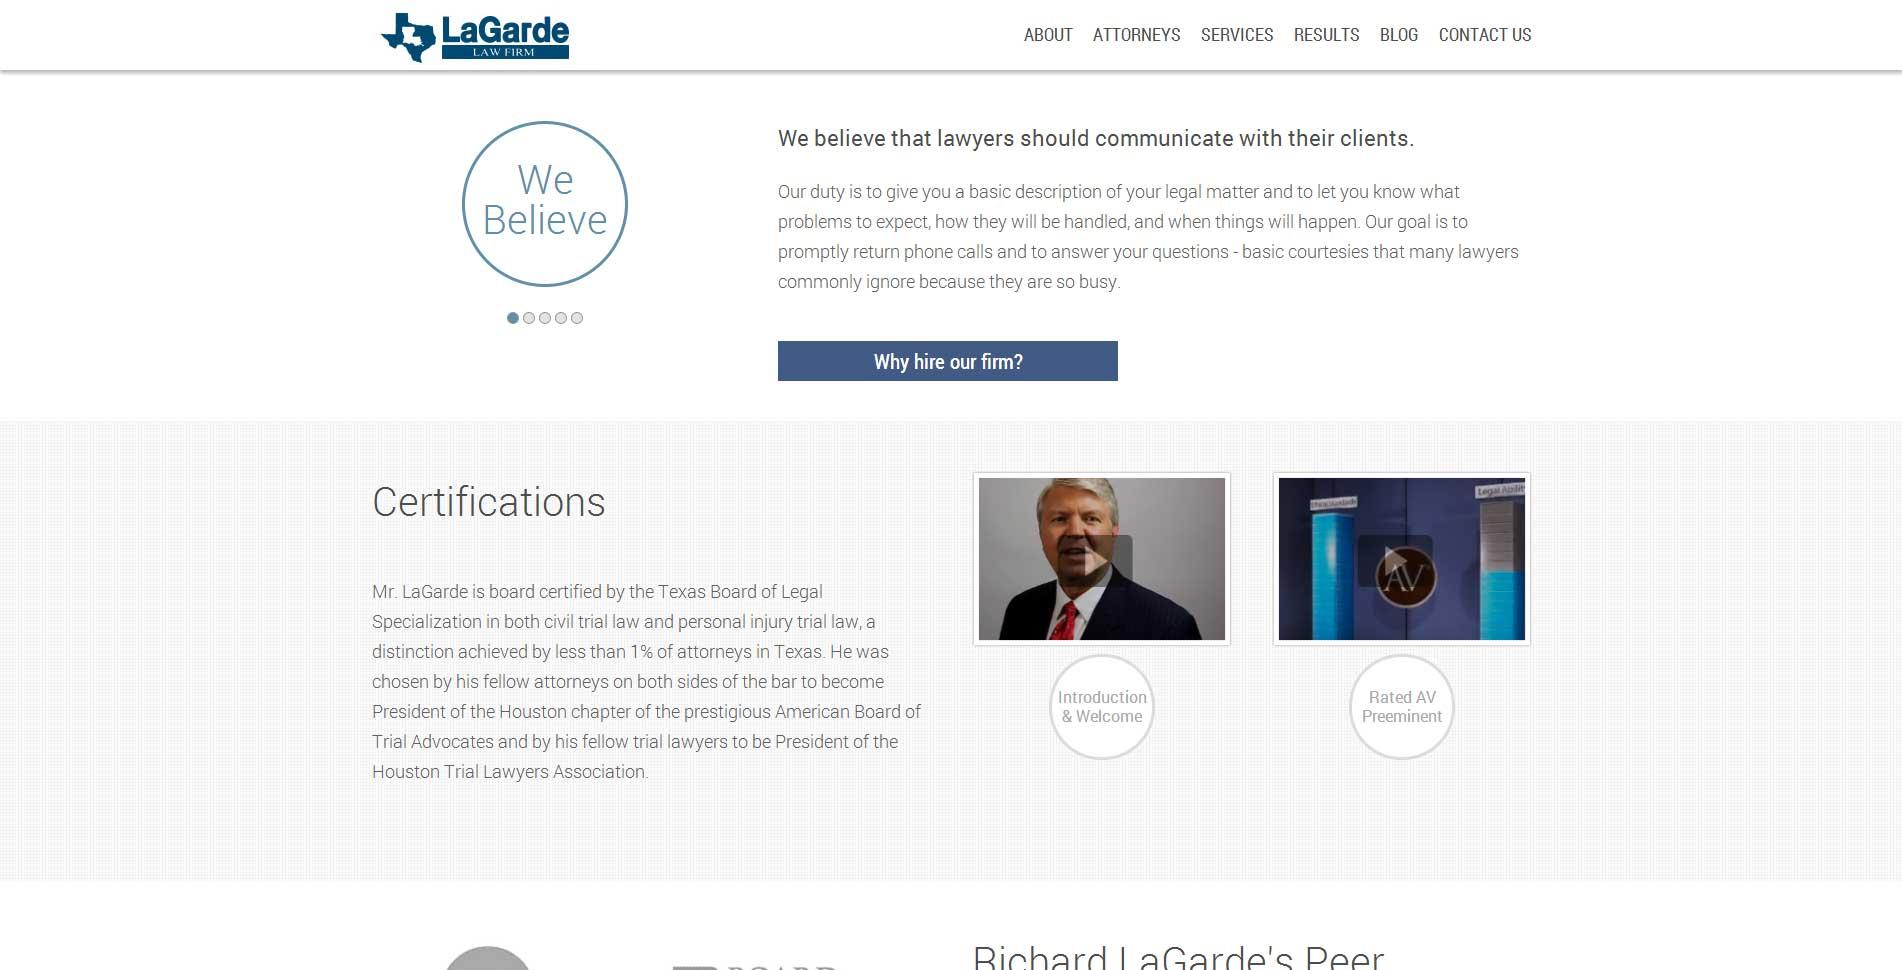 hermes creative awards winner custom legal marketing an adviatech company